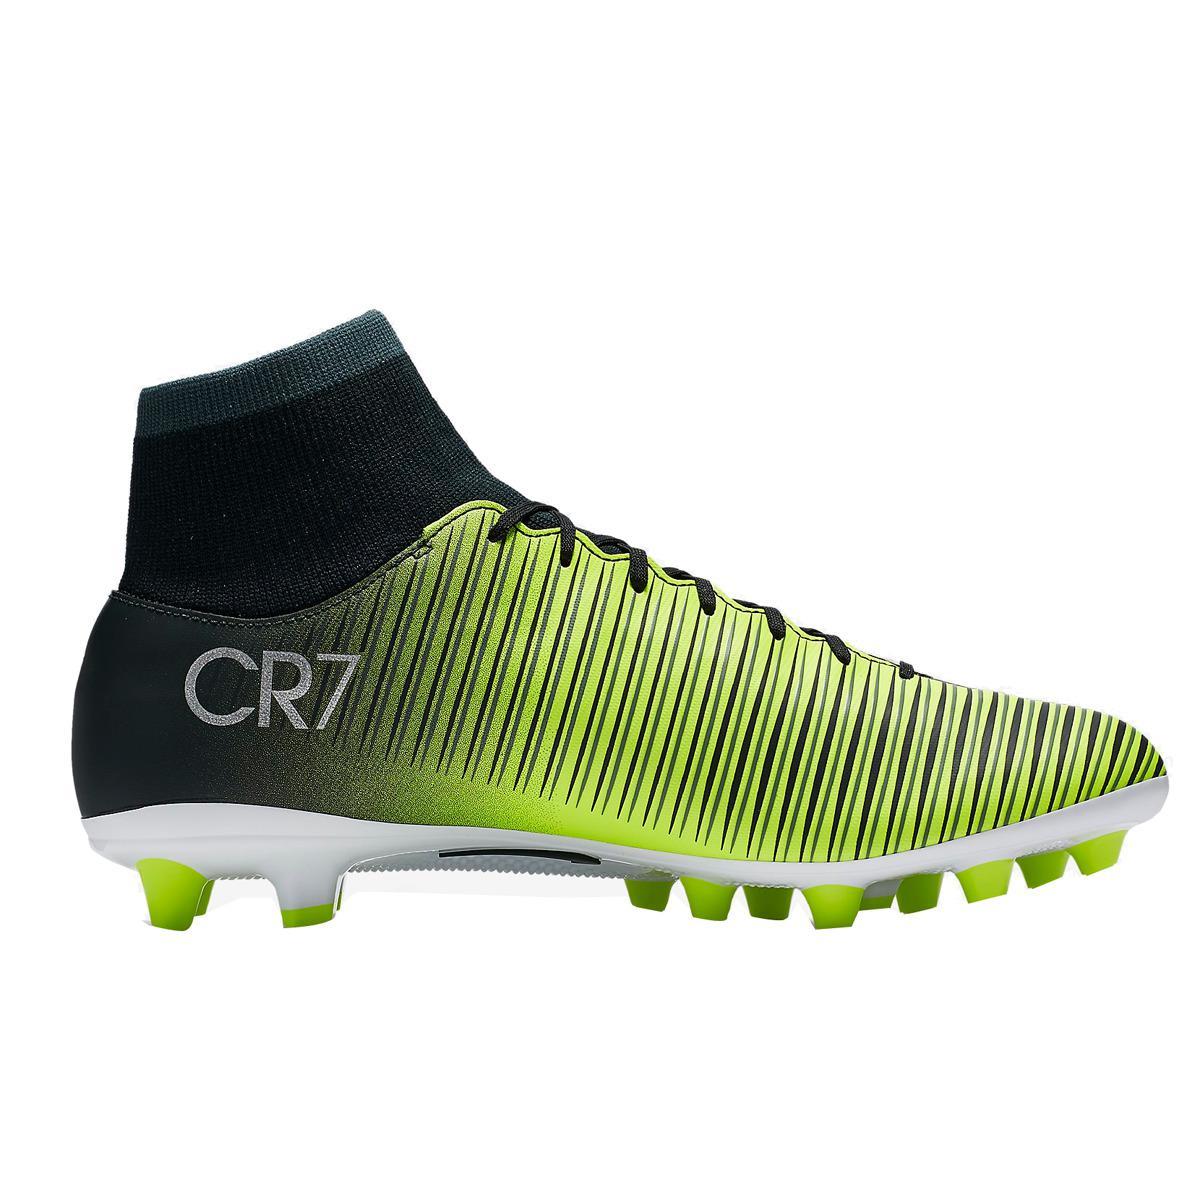 8f0ea8437 Lyst - Nike Mercurial Victory Vi Dynamic Fit Cr7 Ag-pro Football ...